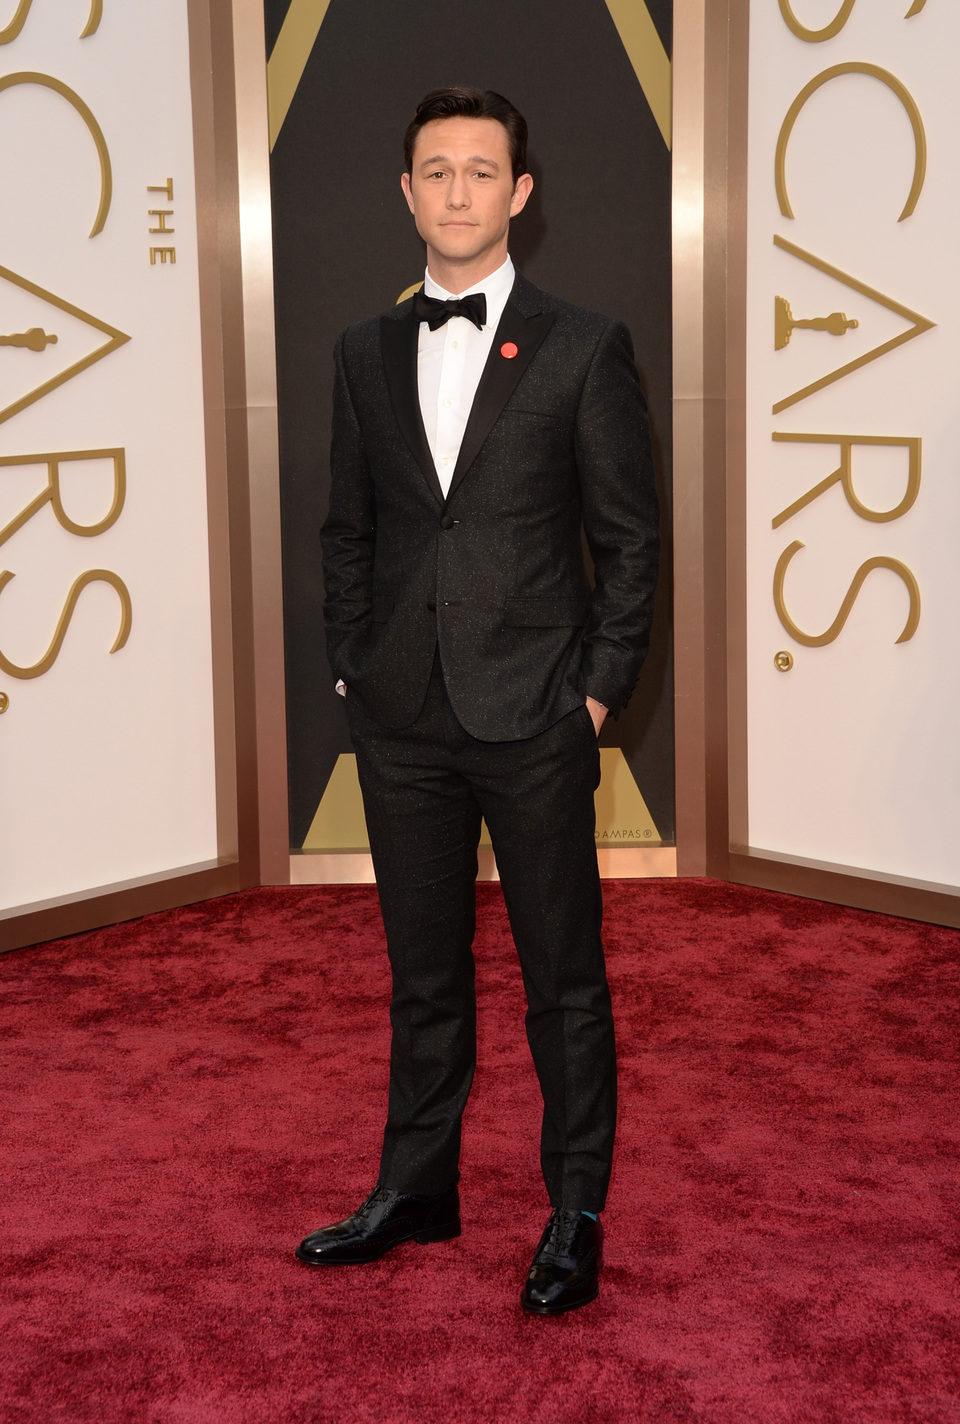 Joseph Gordon-Levitt at the 2014 Oscars